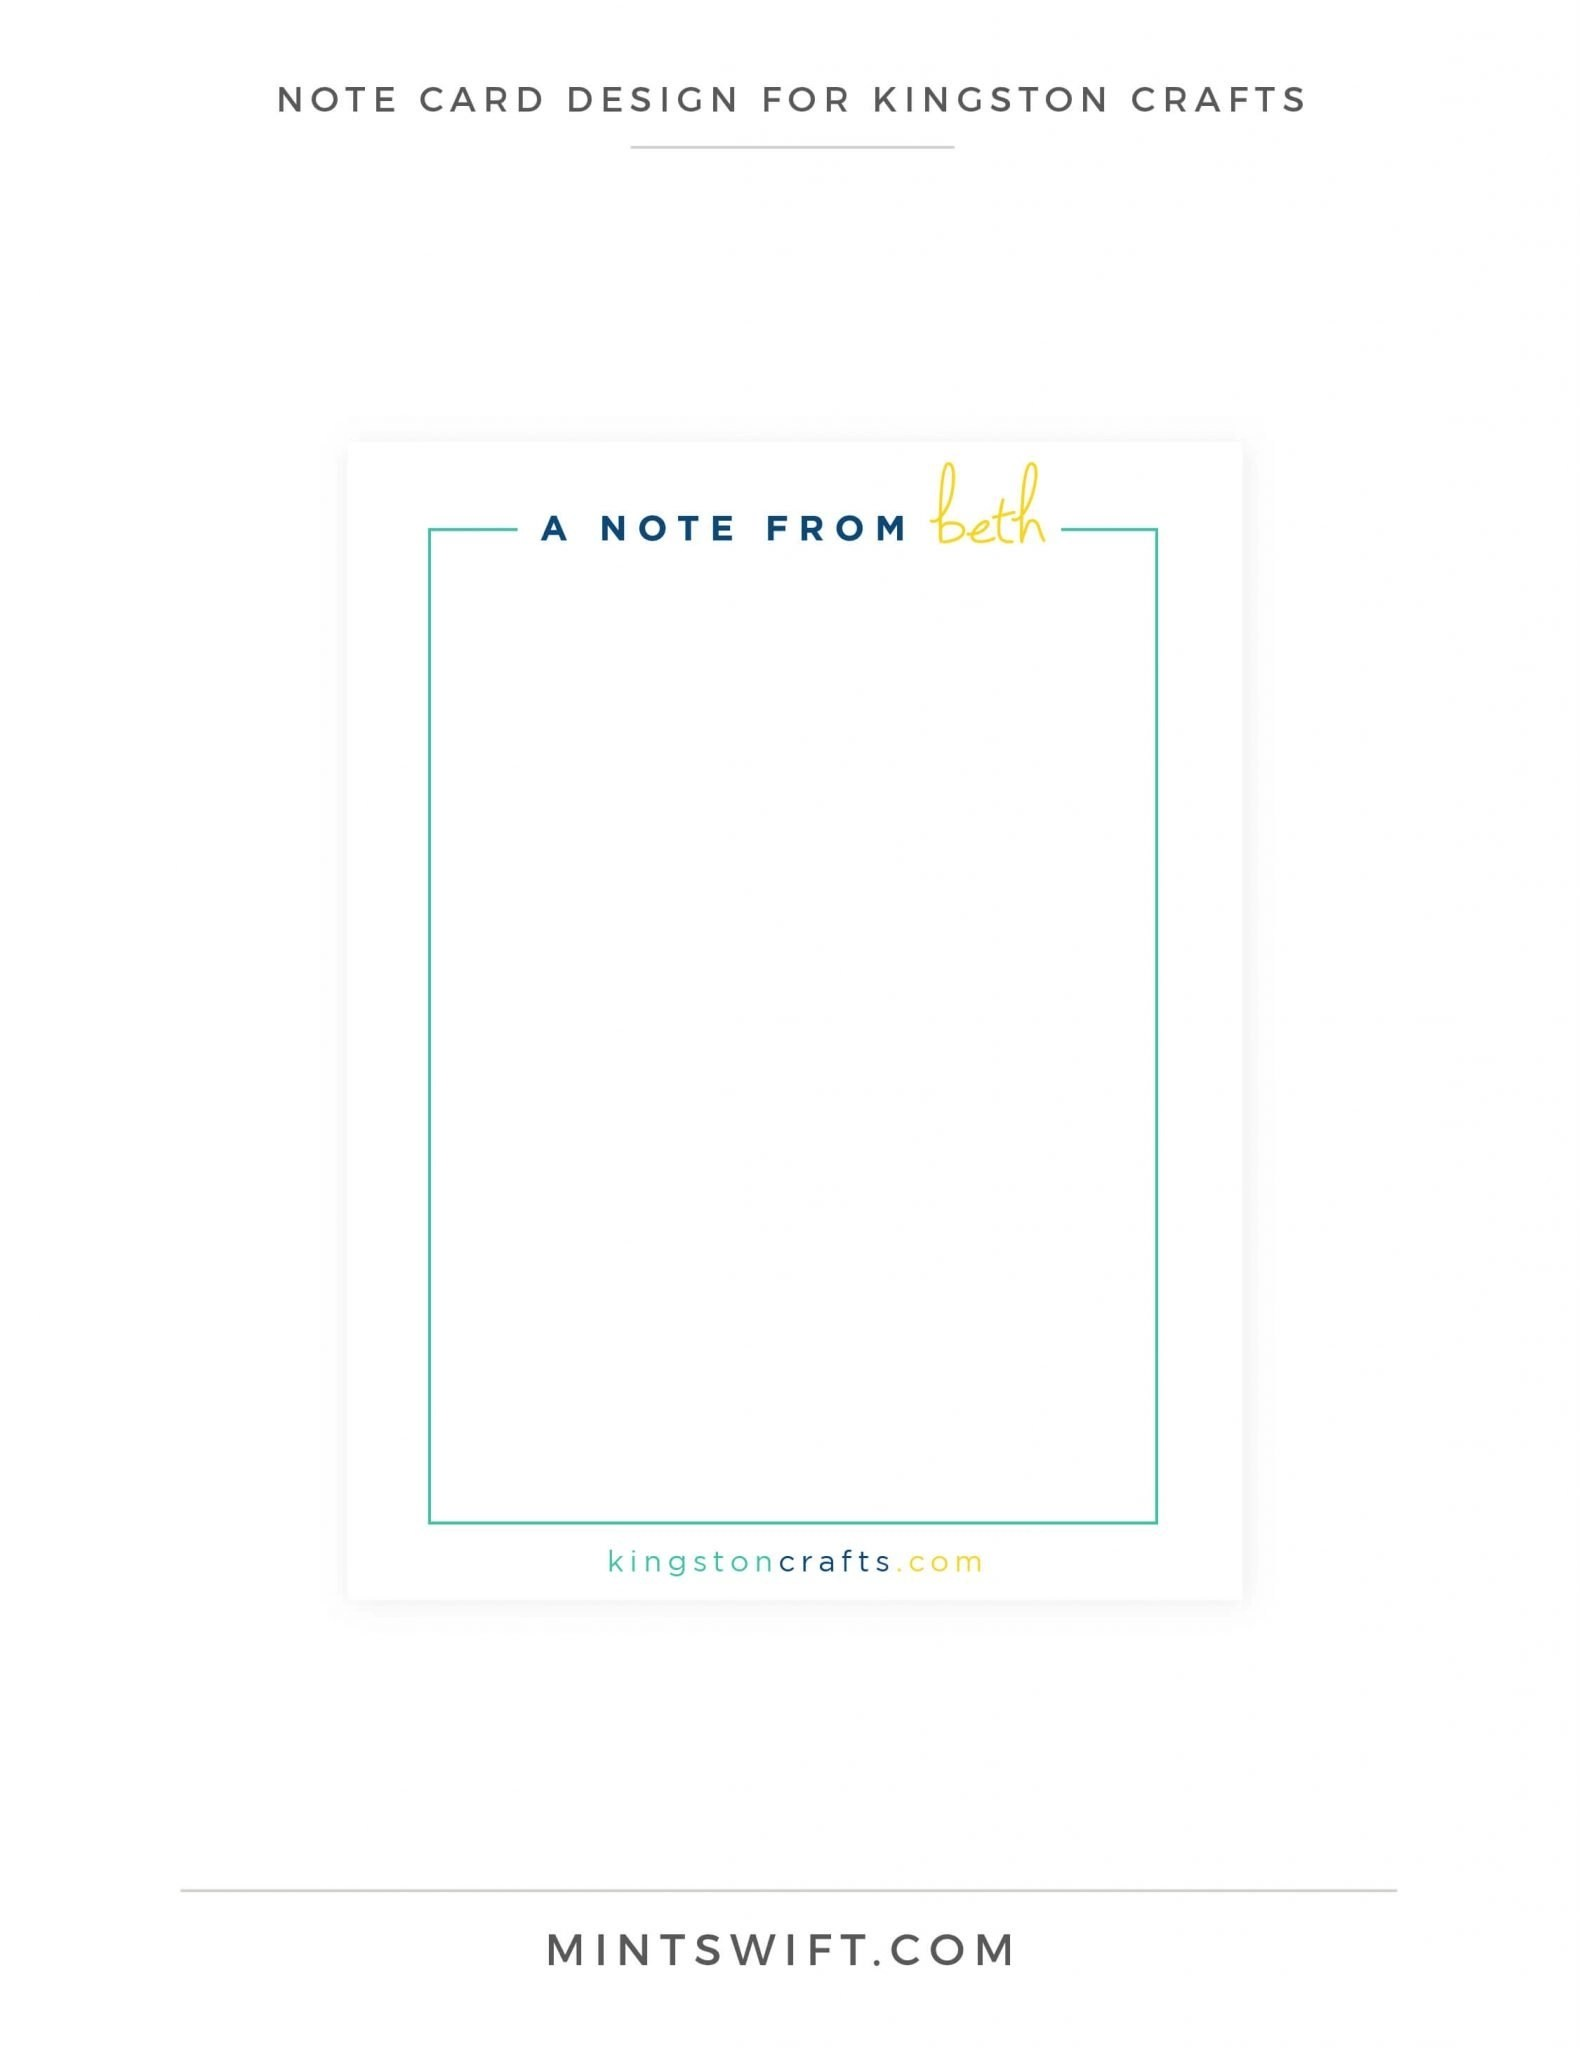 Kingston Crafts - Note Cards Design - Brand Design Package - MintSwift